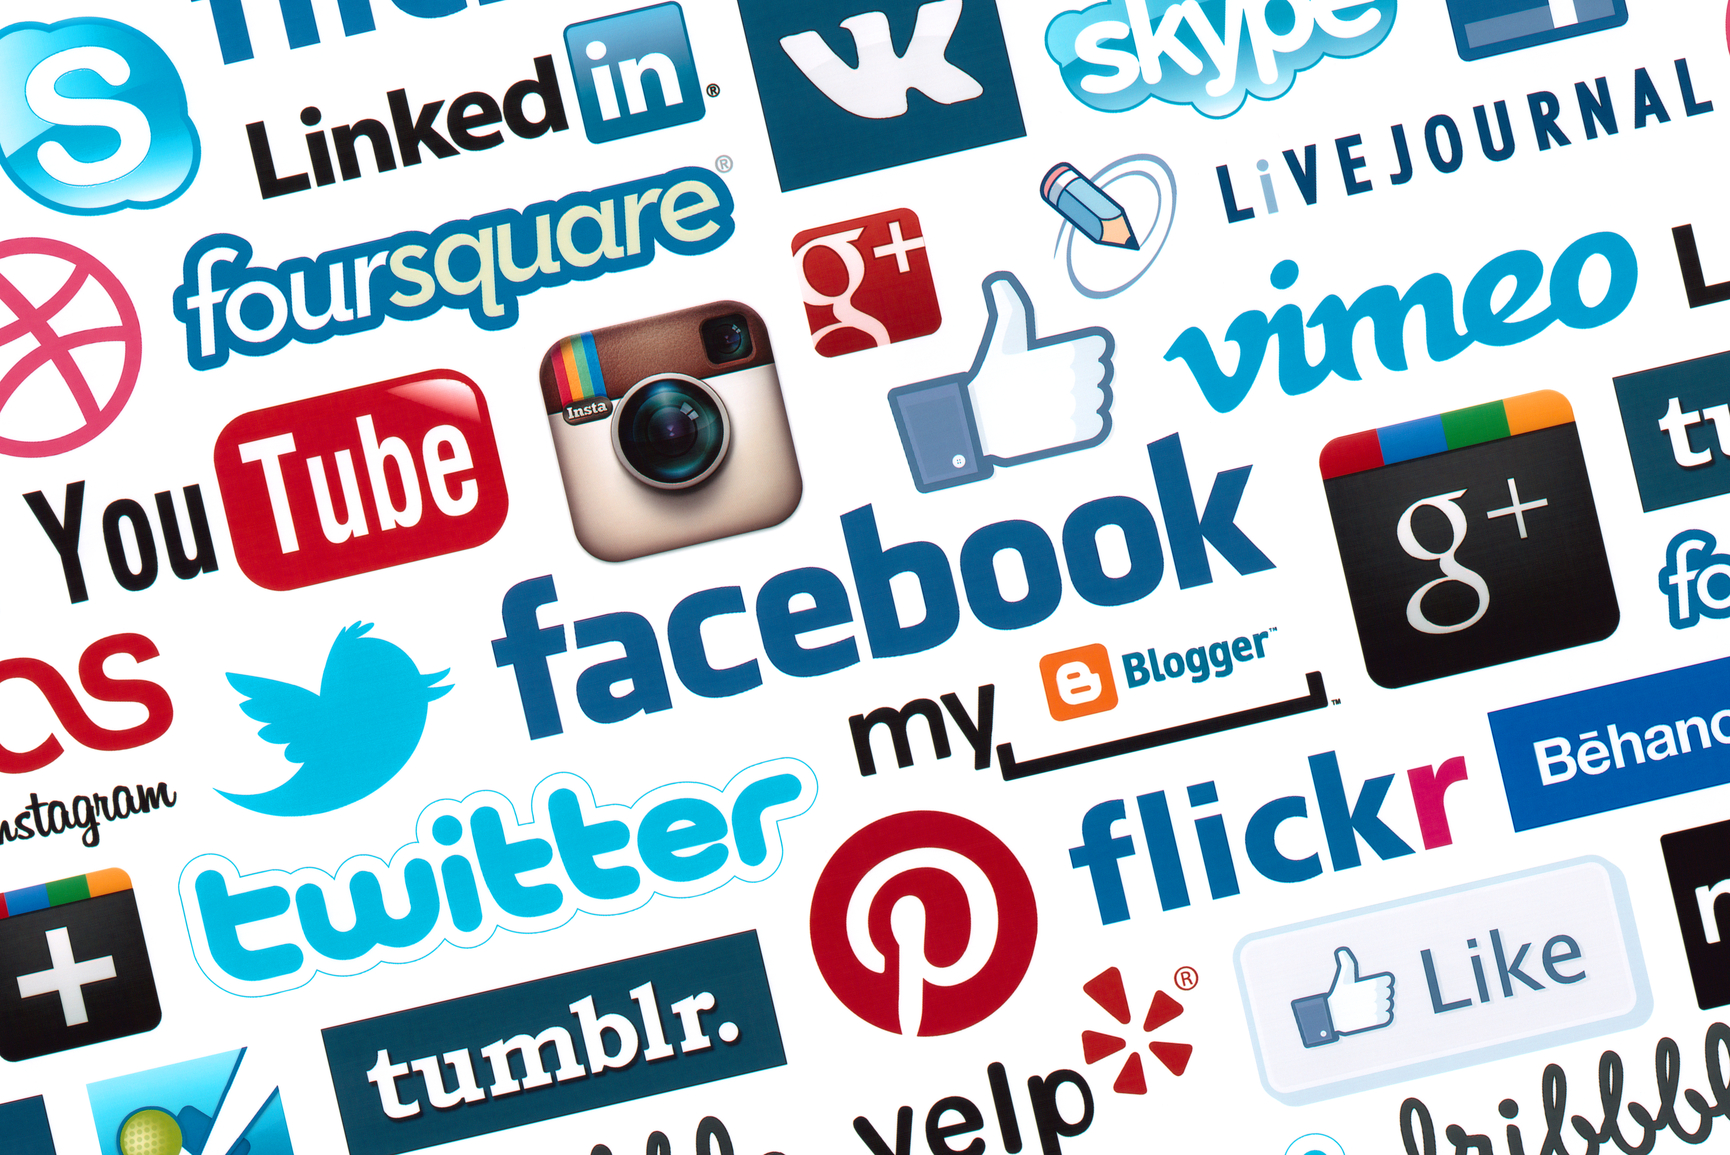 social_media image